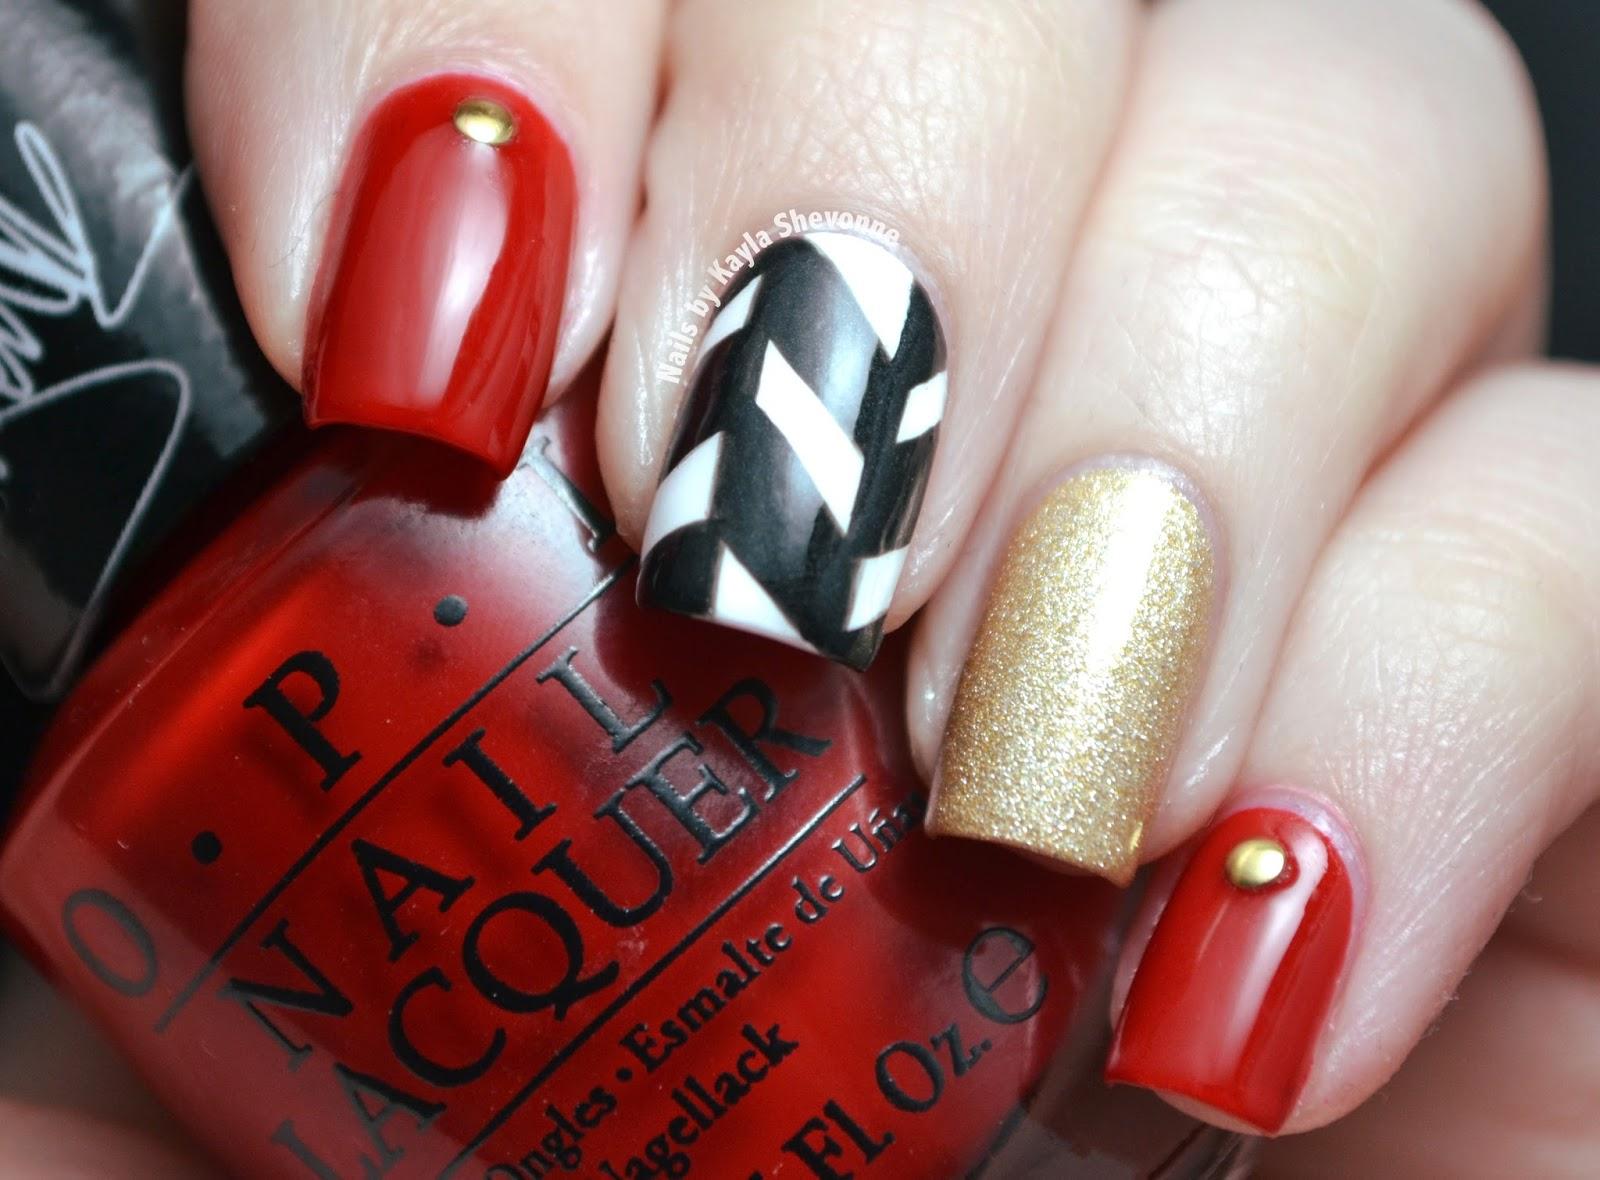 Nails by Kayla Shevonne: Herringbone & Studs - OPI Gwen Stefani Nail Art